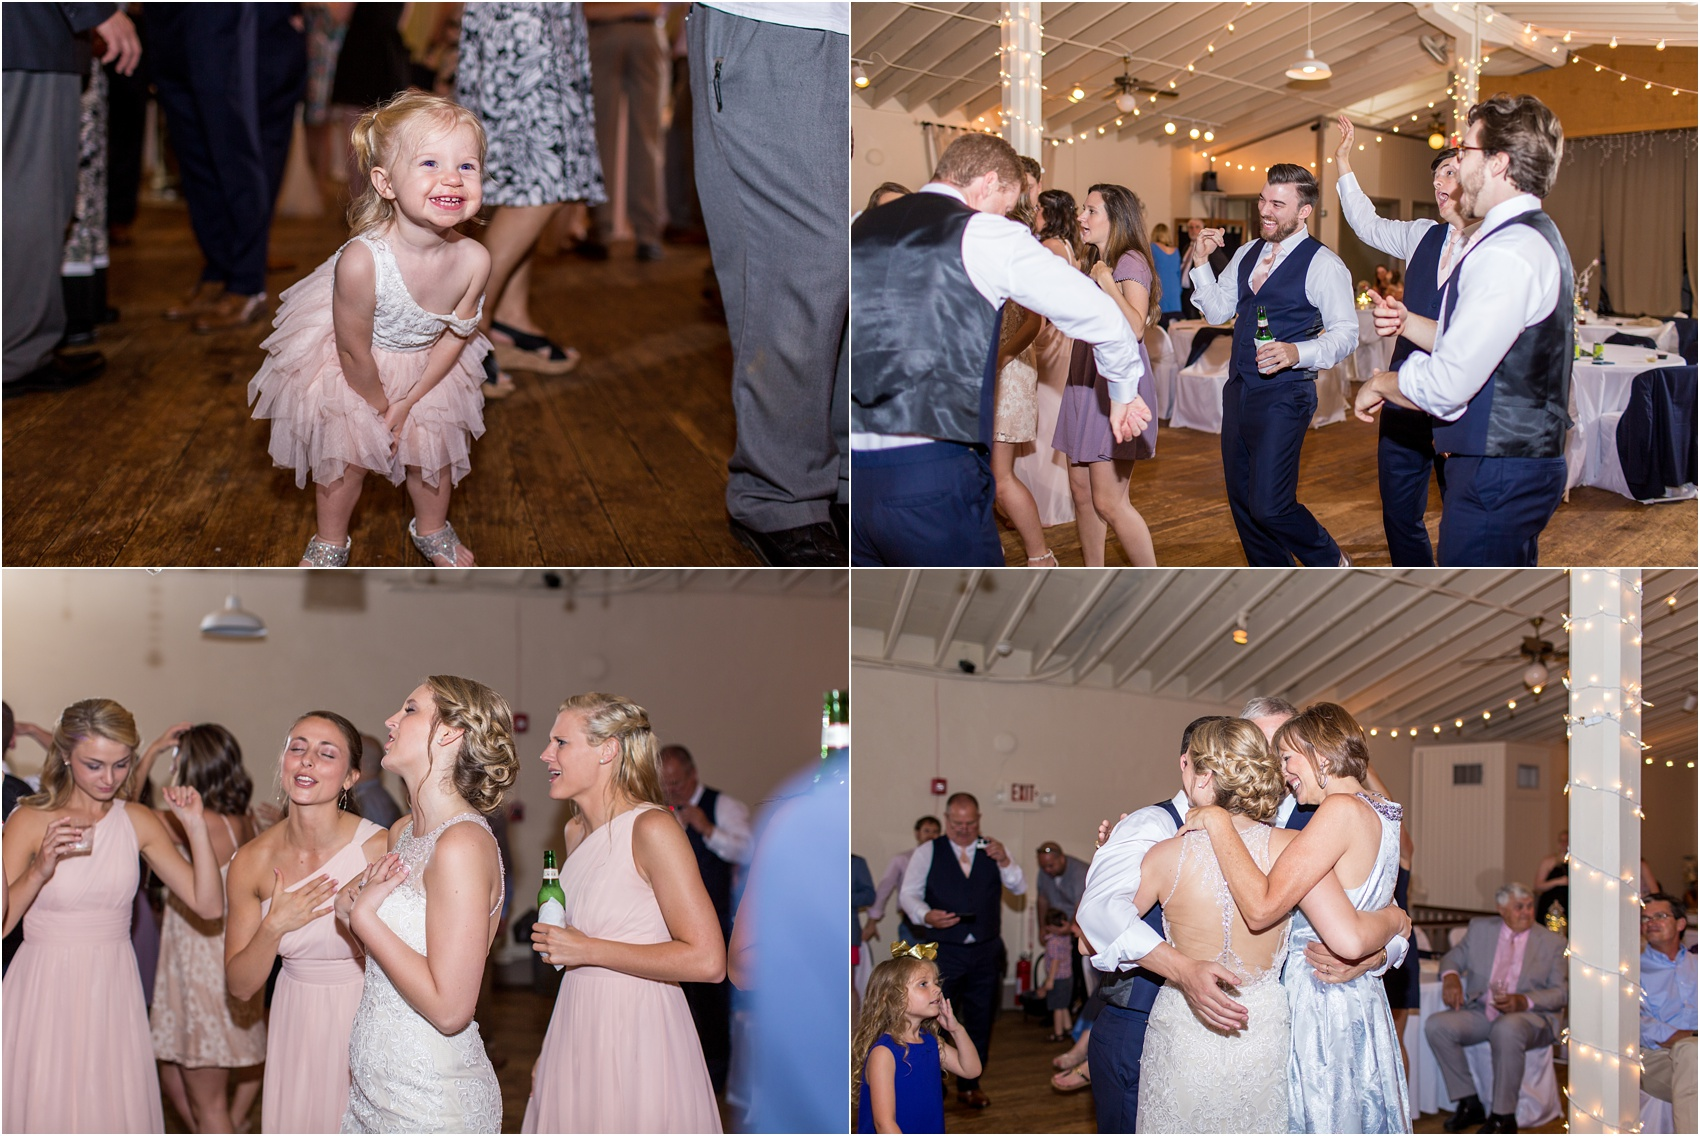 Savannah Eve Photography- Roper-Powell Wedding- Blog-70.jpg